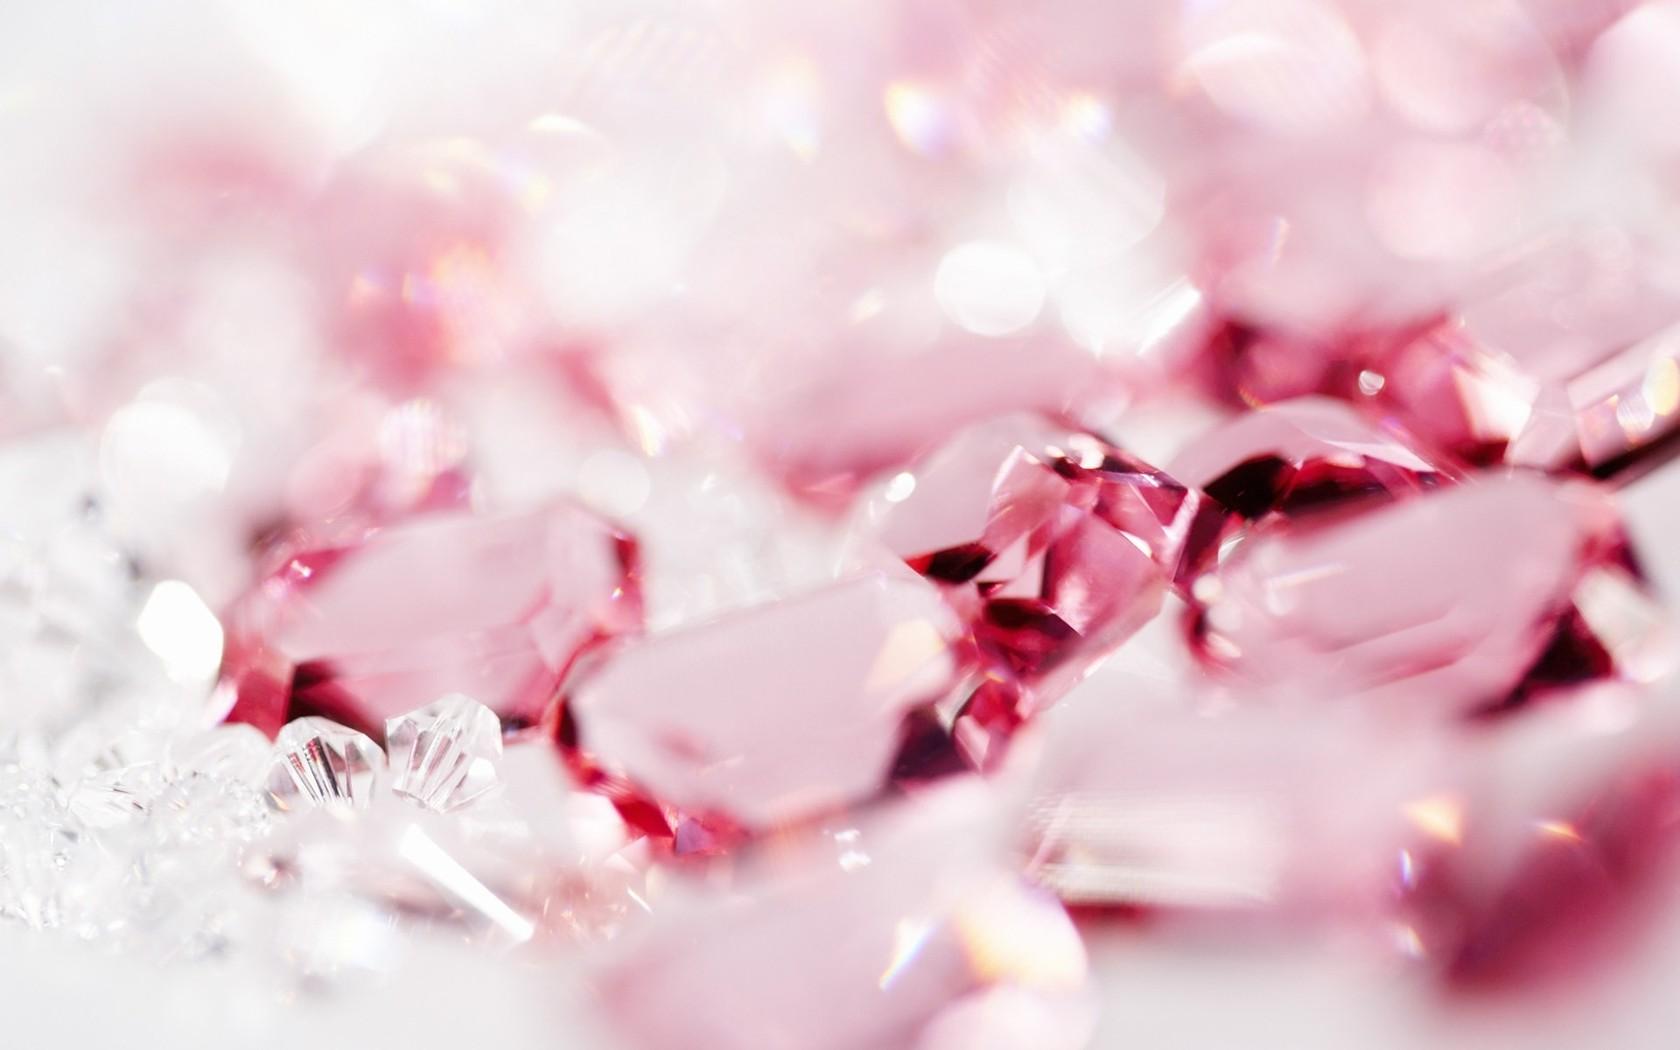 Pink Feathers Falling Wallpaper 超簡單的水晶消磁法 Mstory